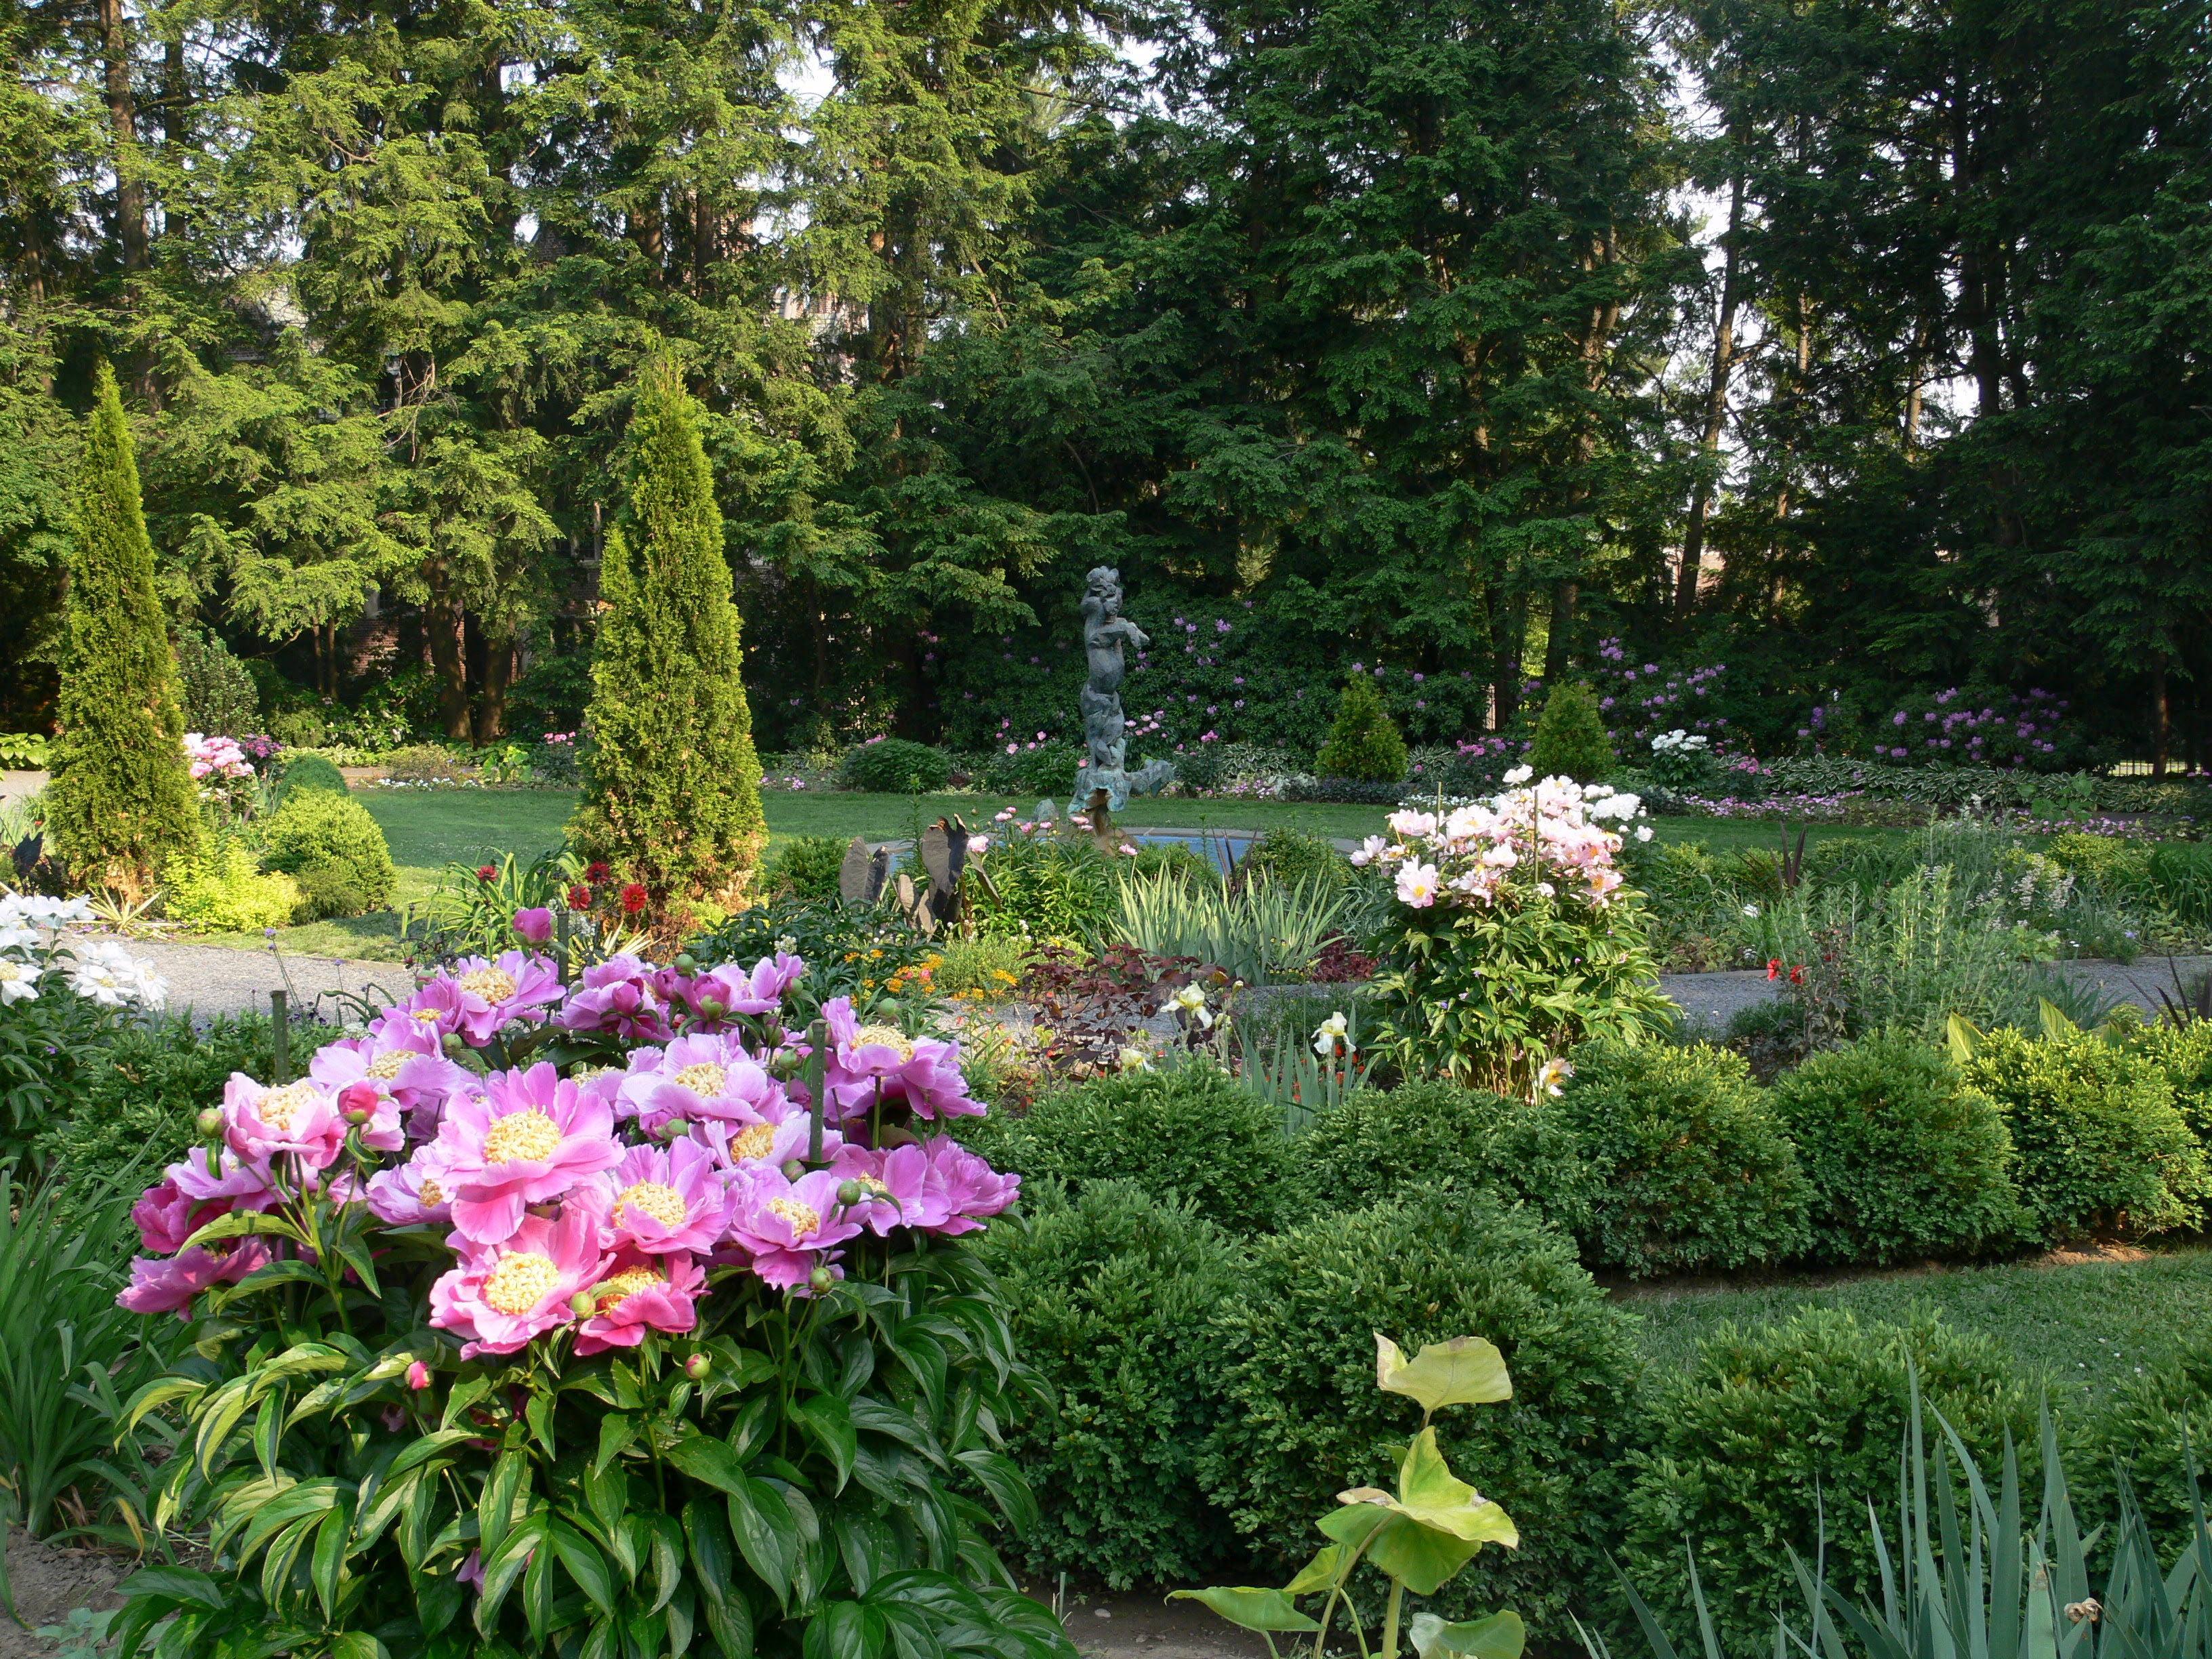 Description Prospect Garden Flower Garden 2 Princeton.jpg